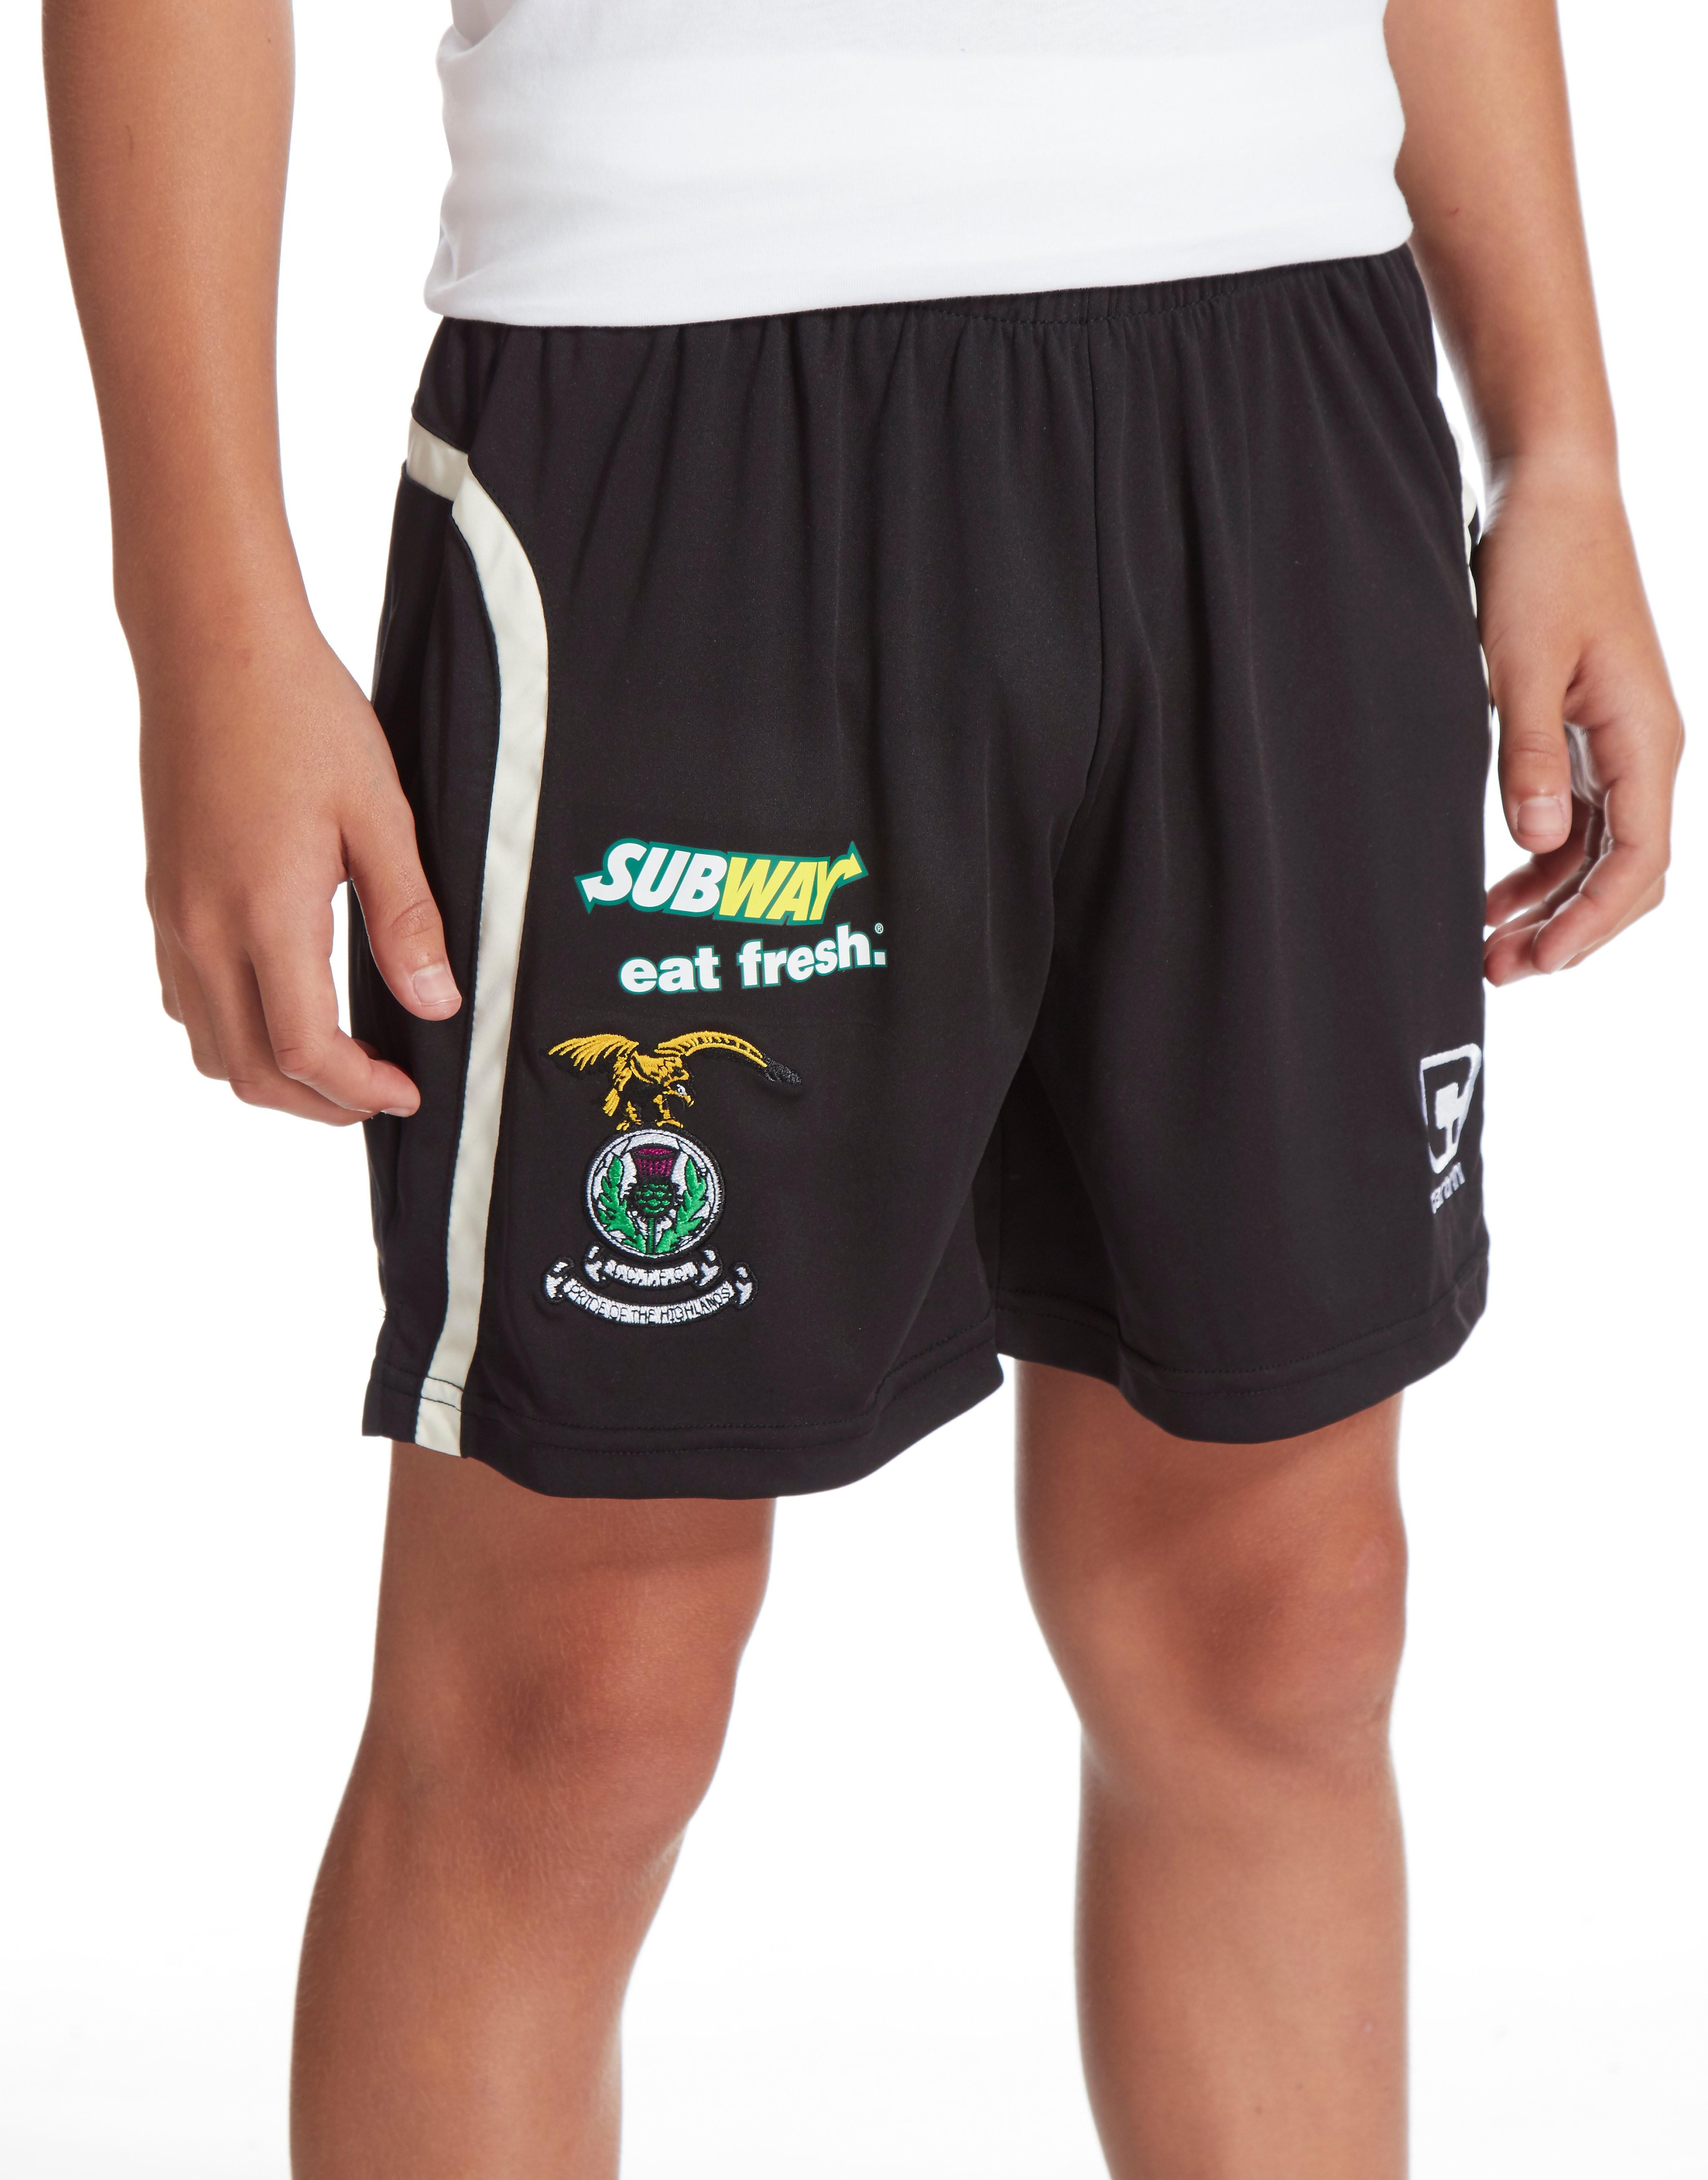 Carbrini Inverness CT 2016/17 Away Shorts Junior